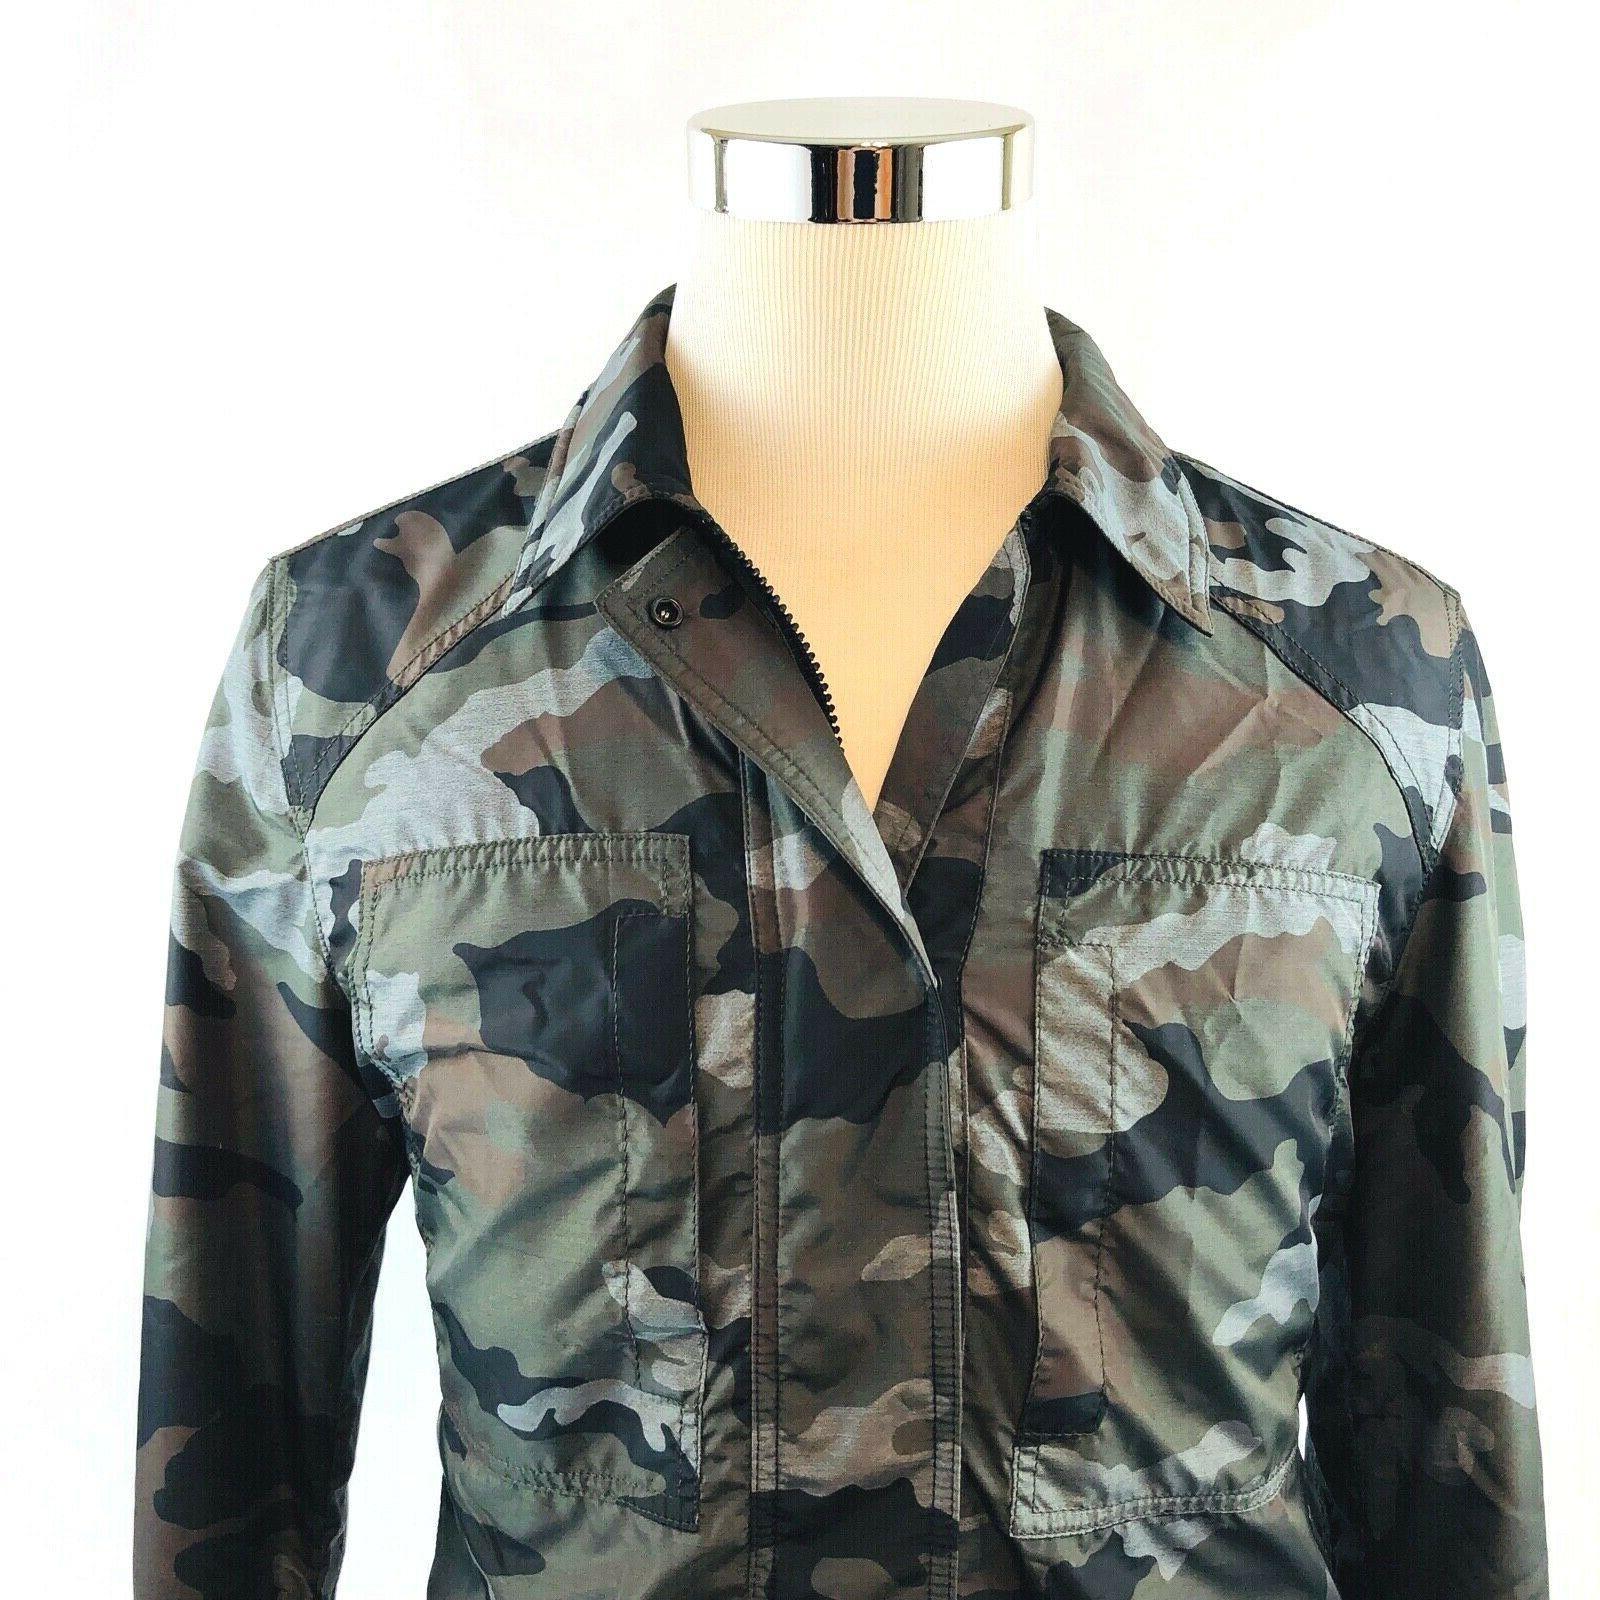 tom thorncroft camoflauge insulated lightweight jacket coat